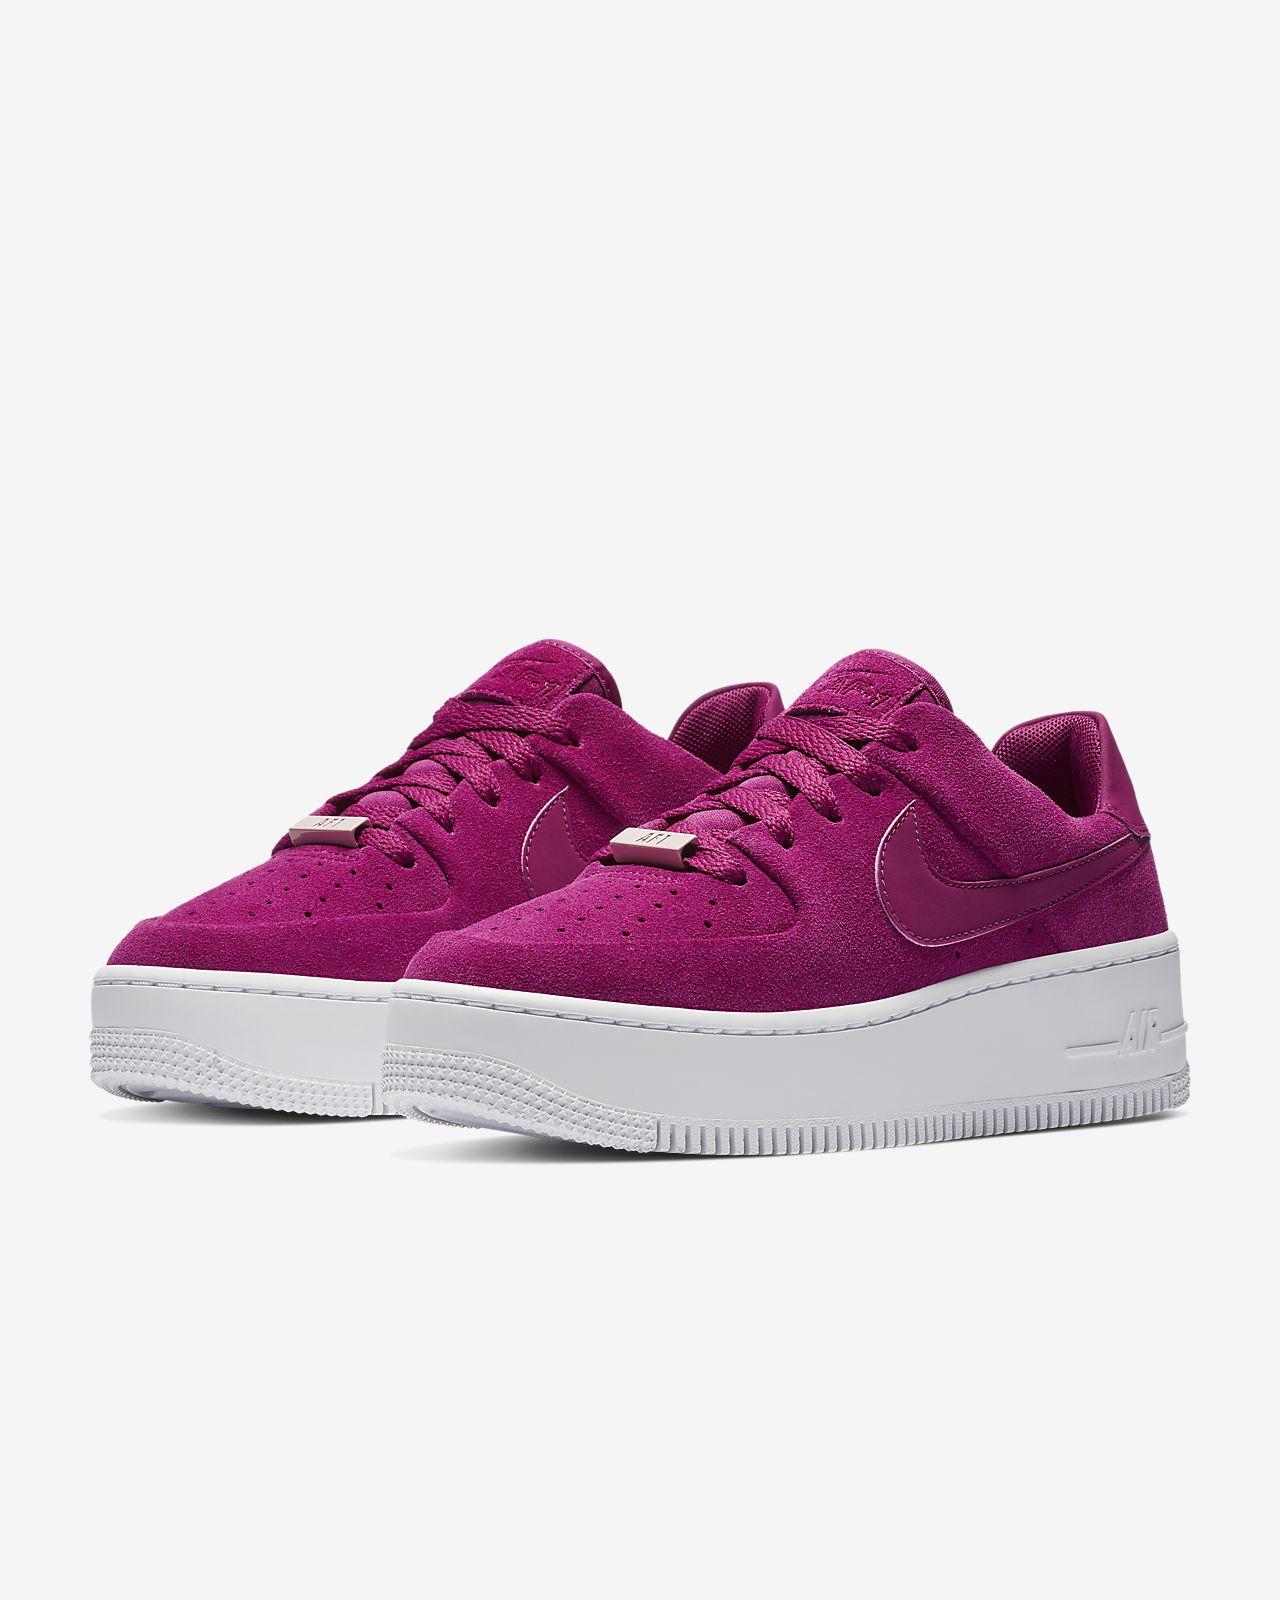 4ffc9ed98 Nike Air Force 1 Sage Low Women s Shoe. Nike.com NL